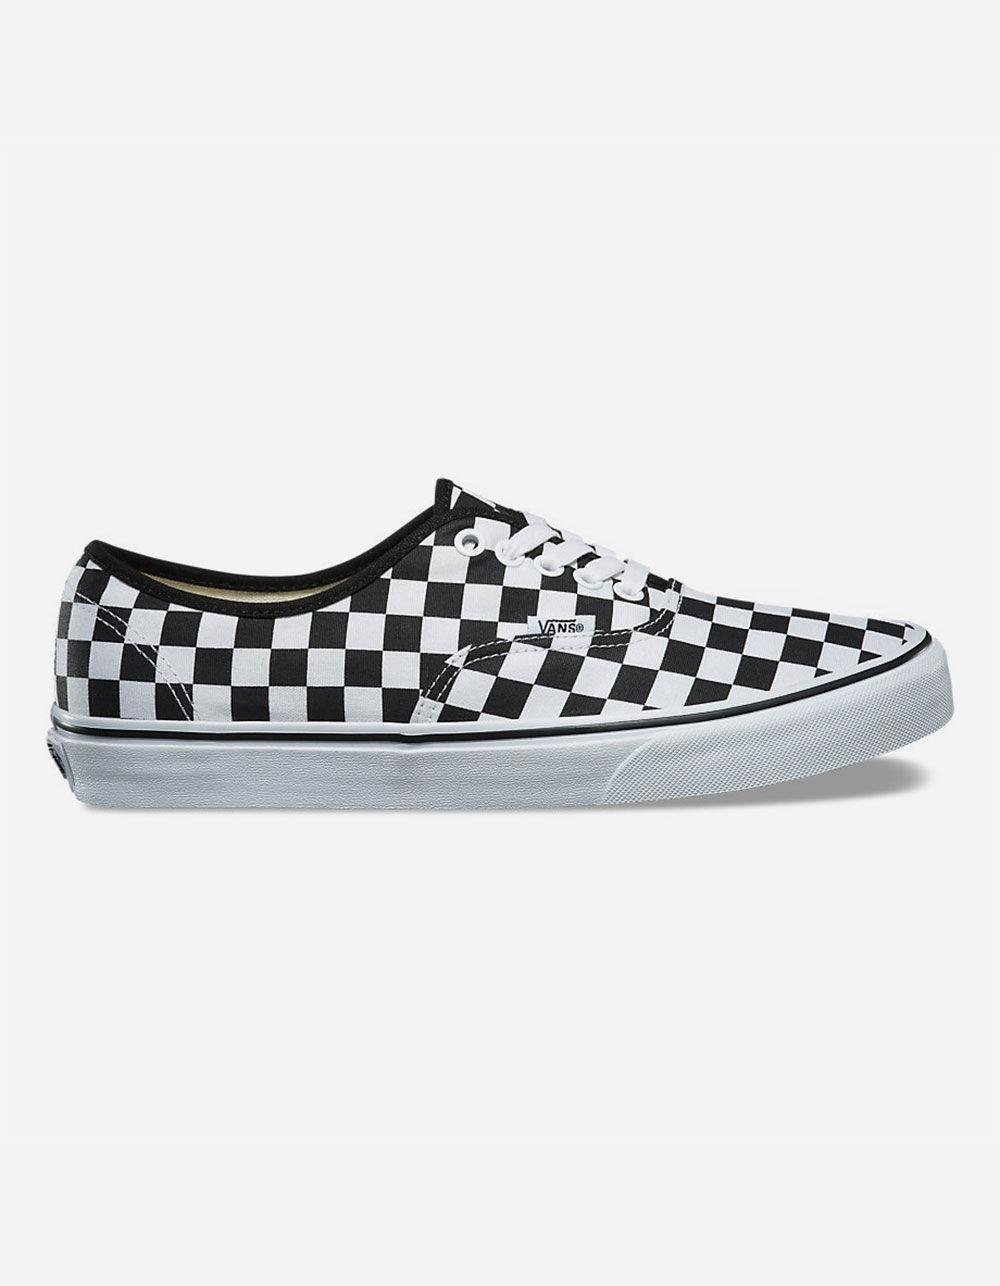 vans checker board shoes